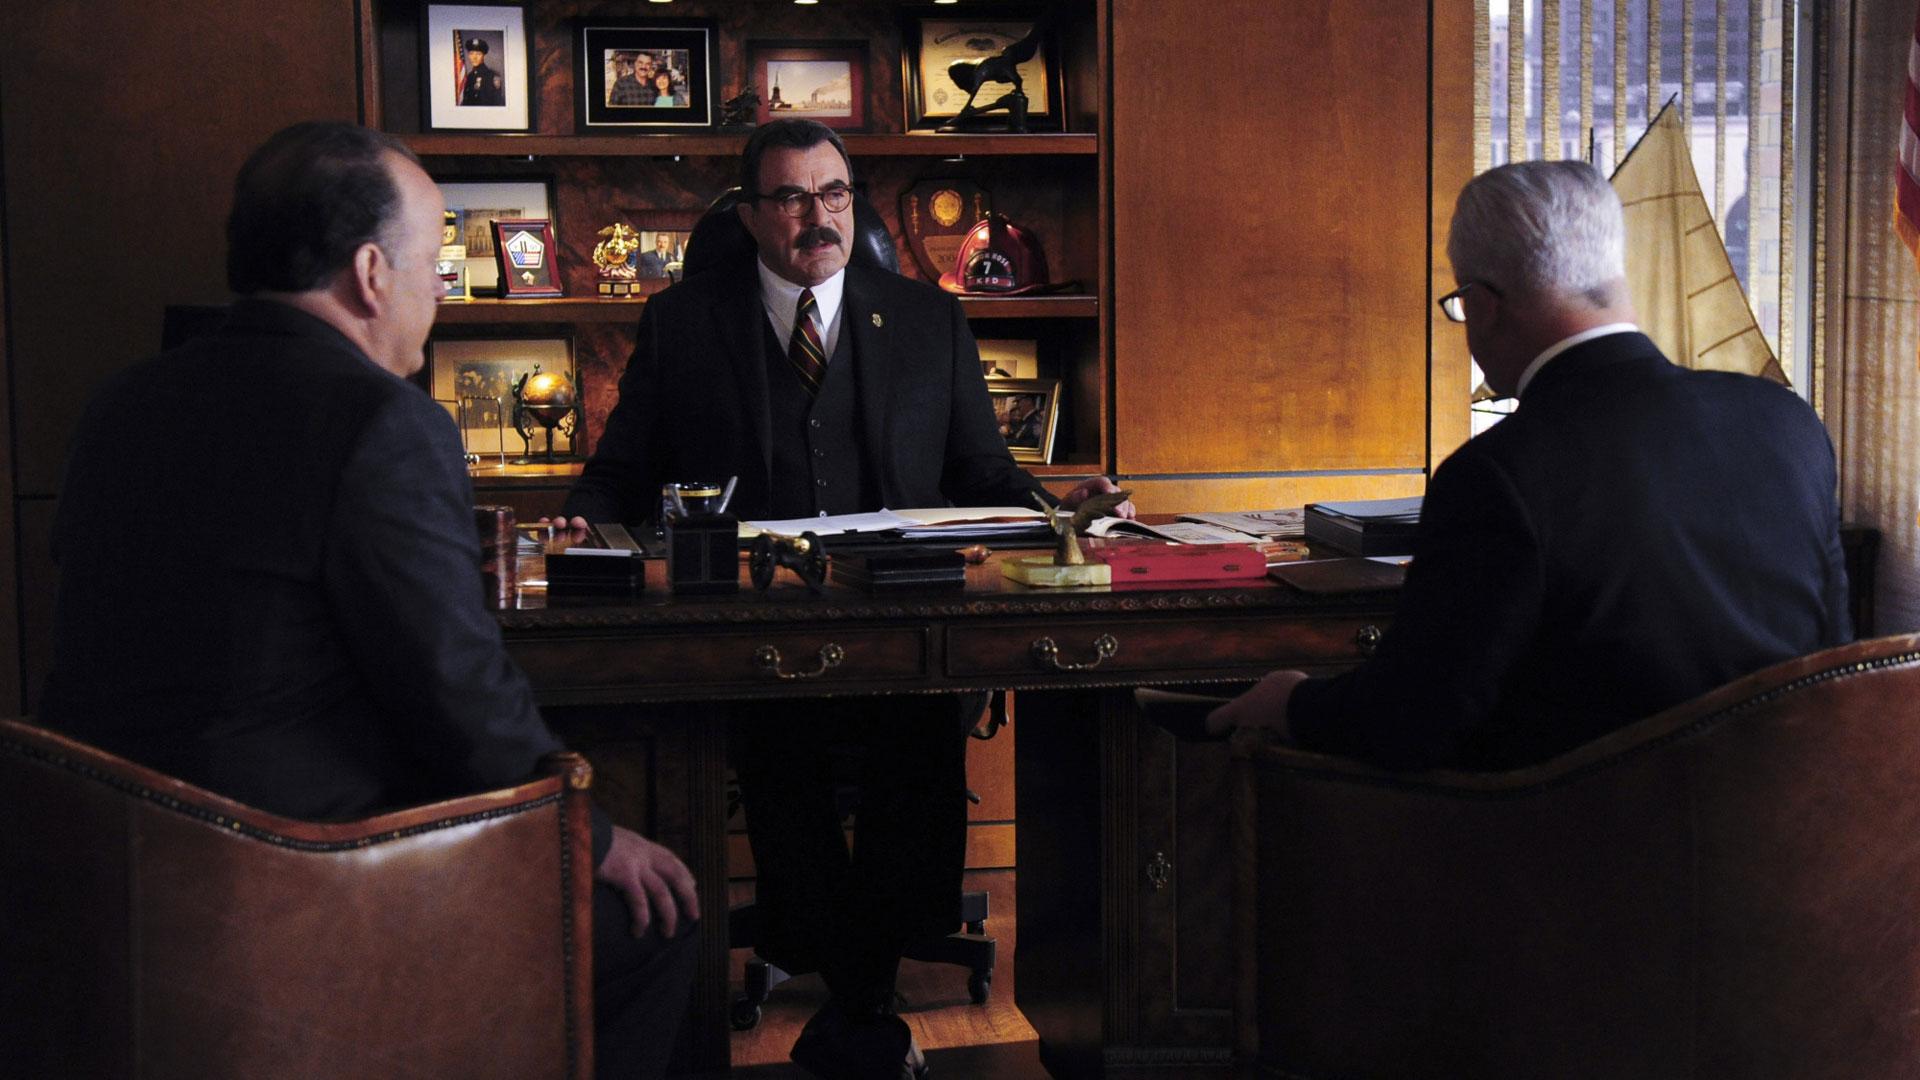 Tom Selleck as Frank Reagan